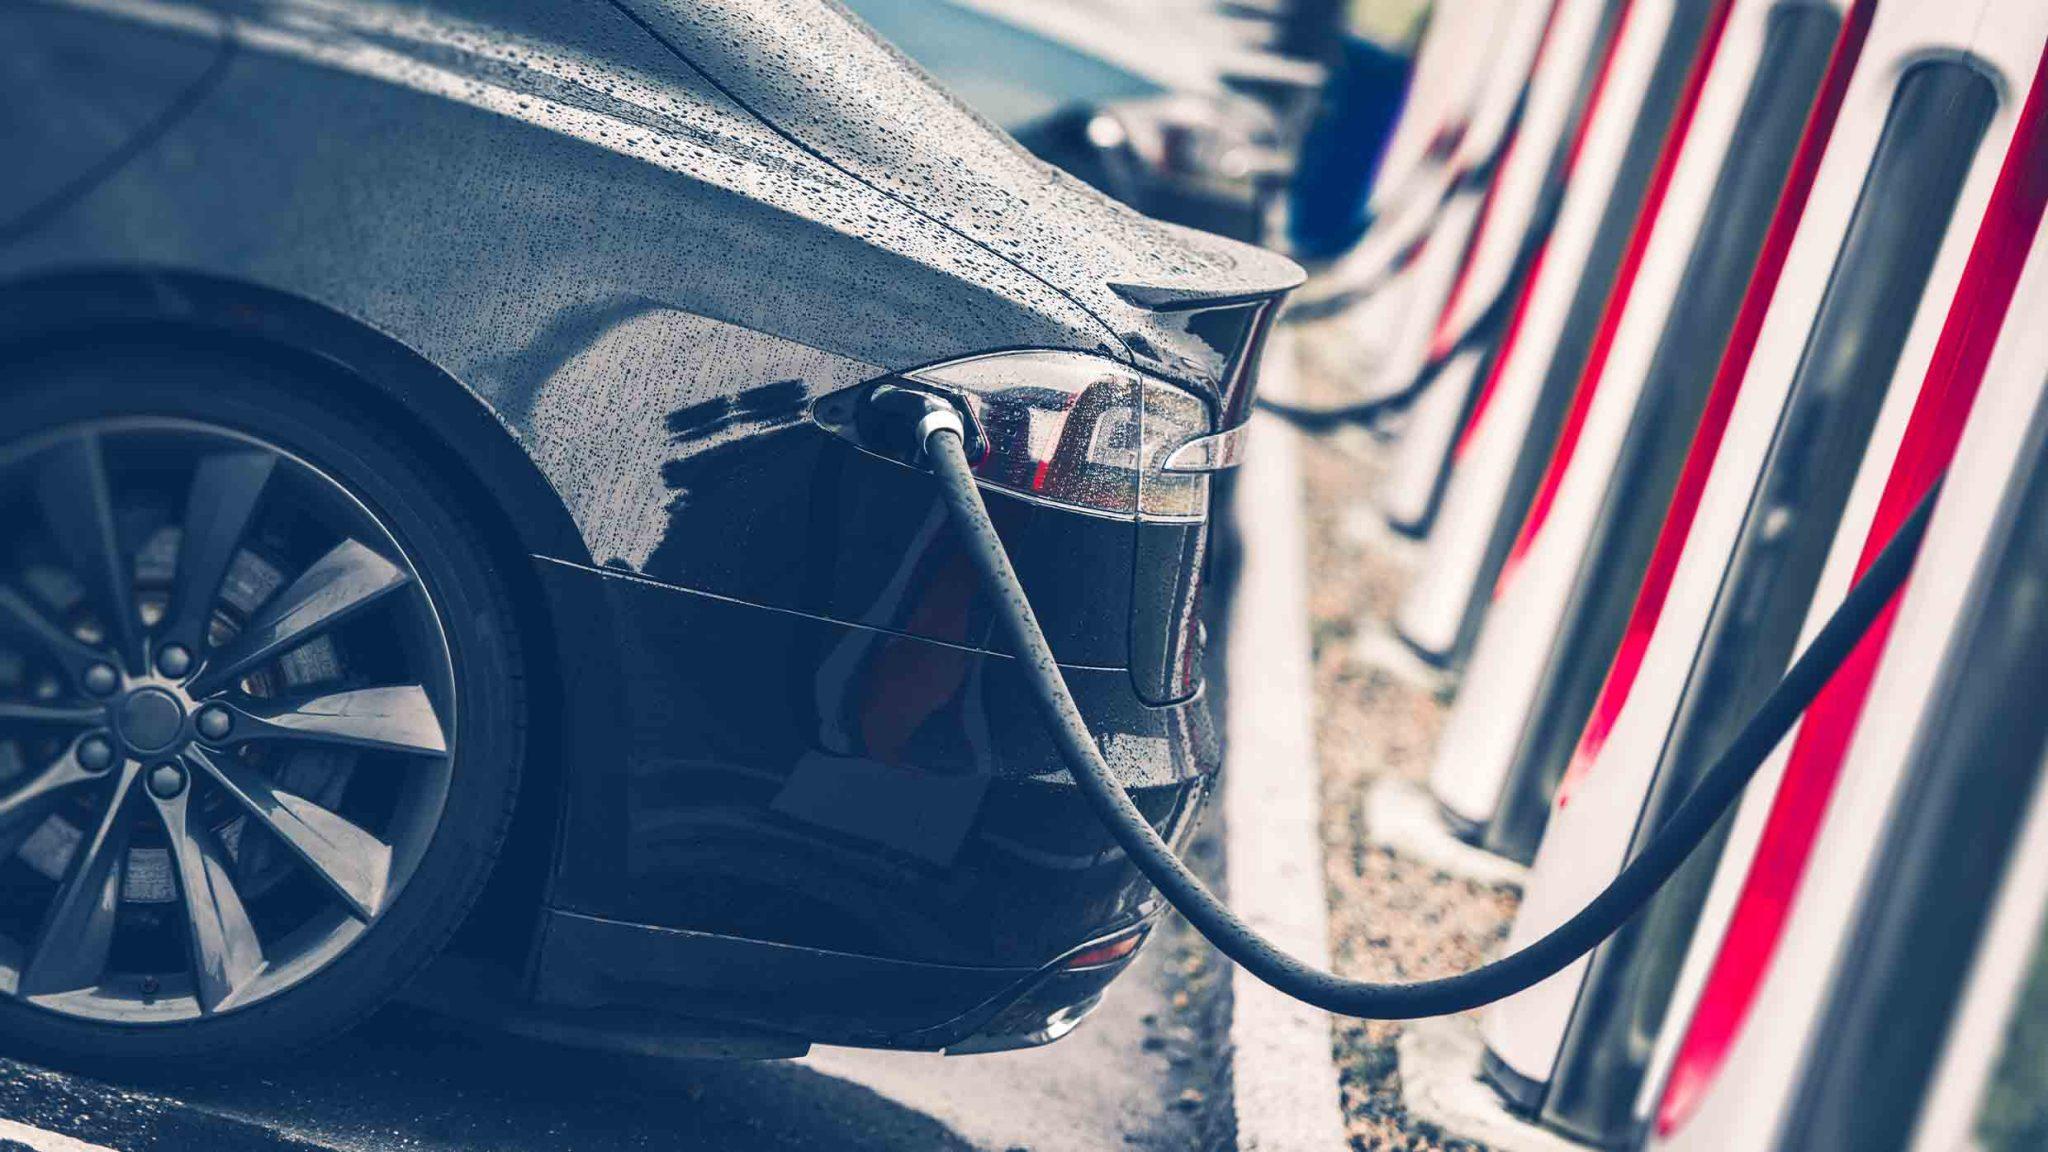 Close up of Tesla public charging station